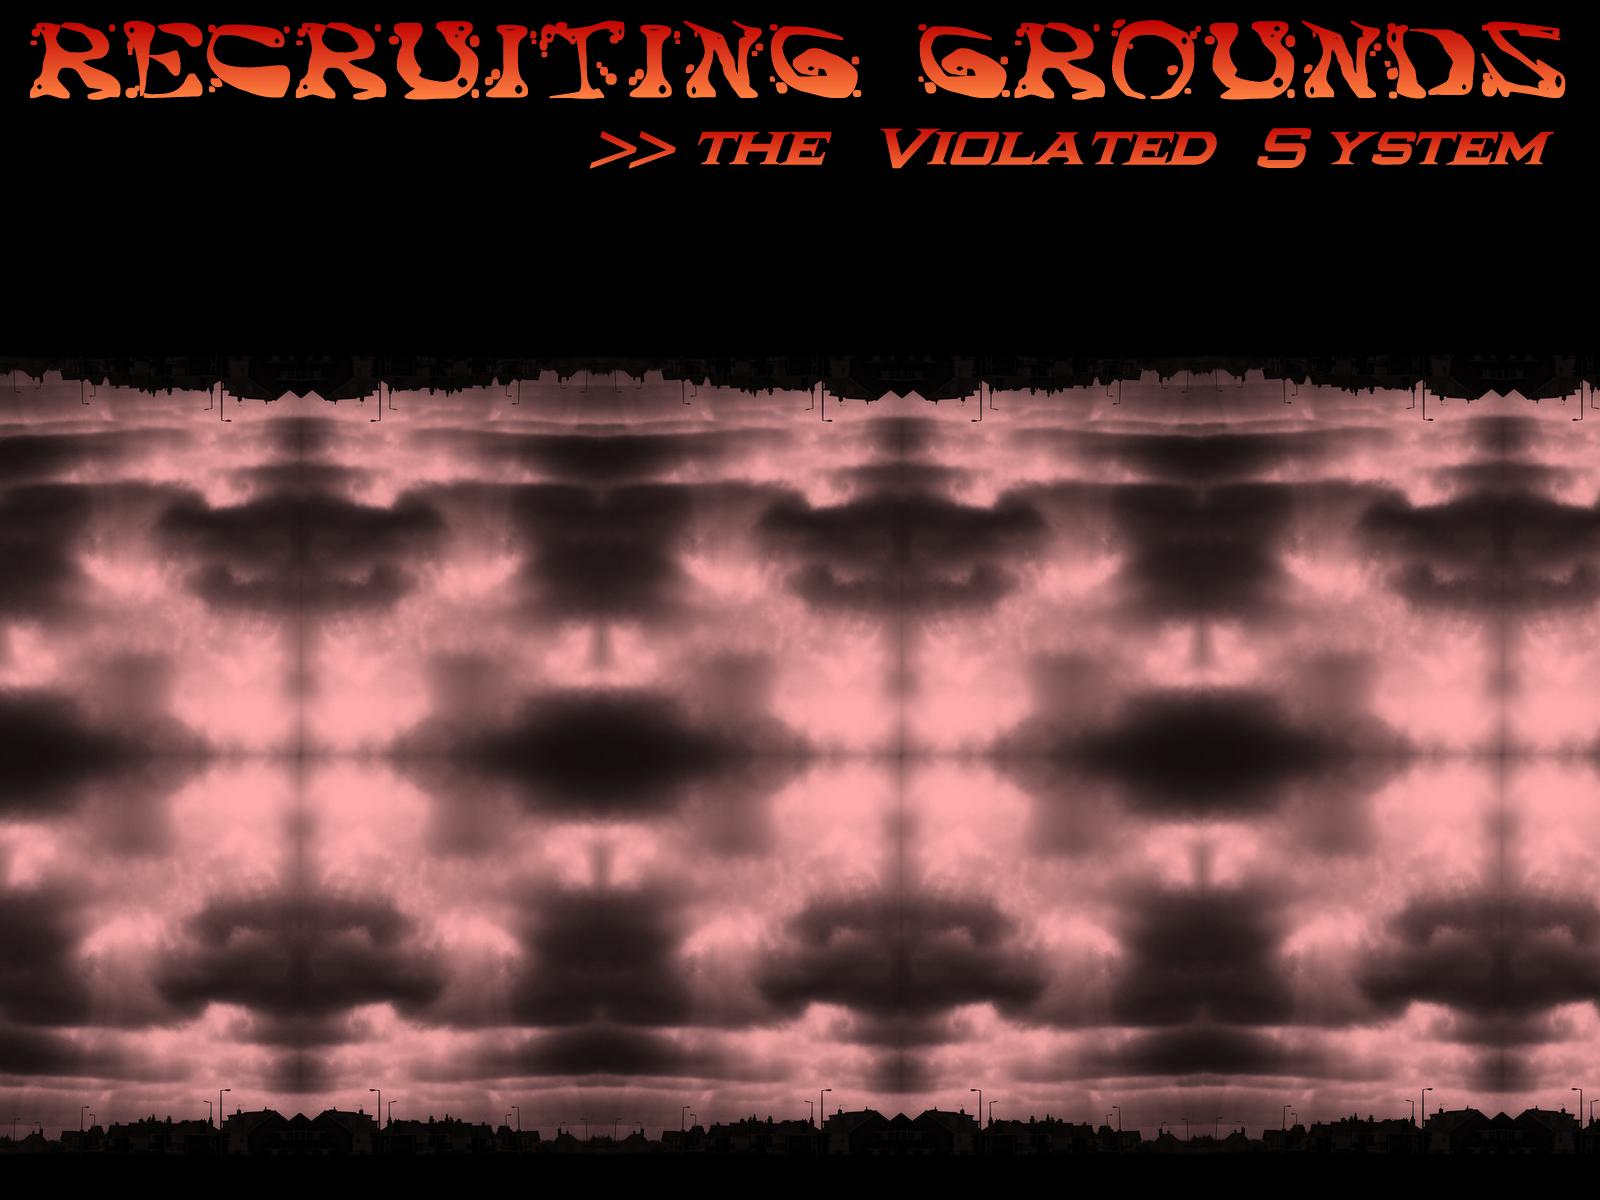 Recruiting Grounds